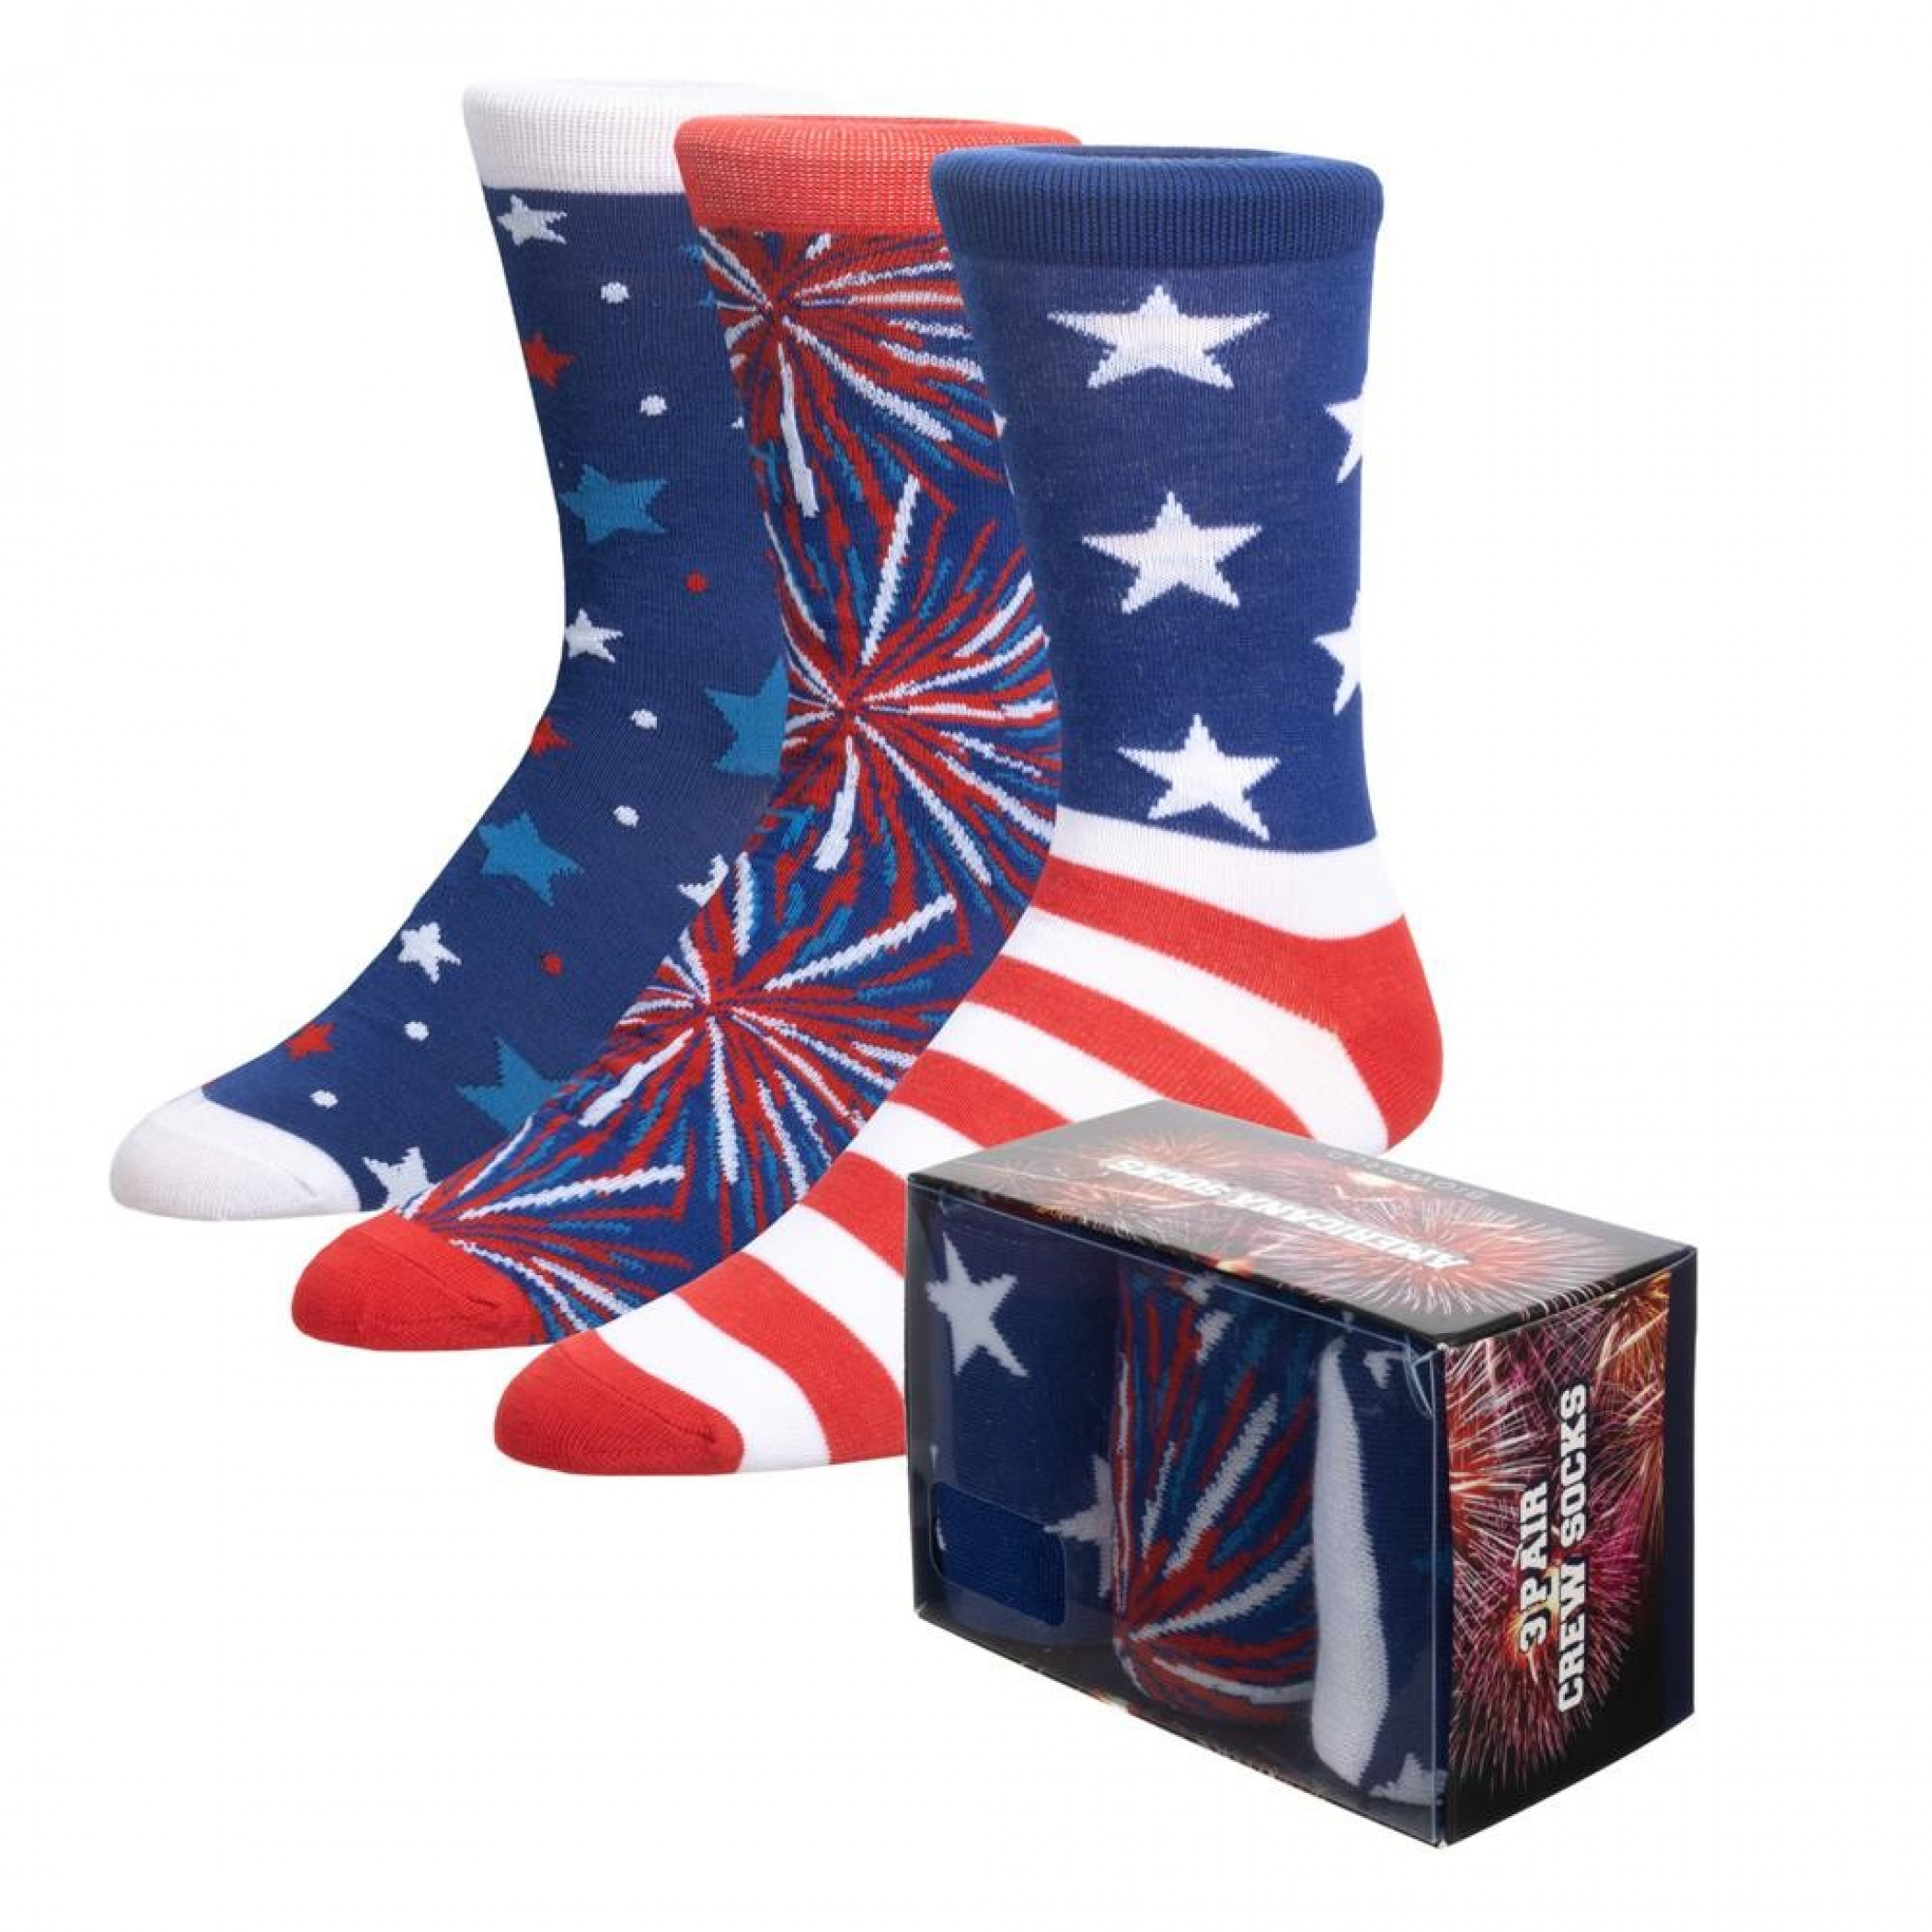 Americana 3-Pair Pack of Crew Socks Box Set